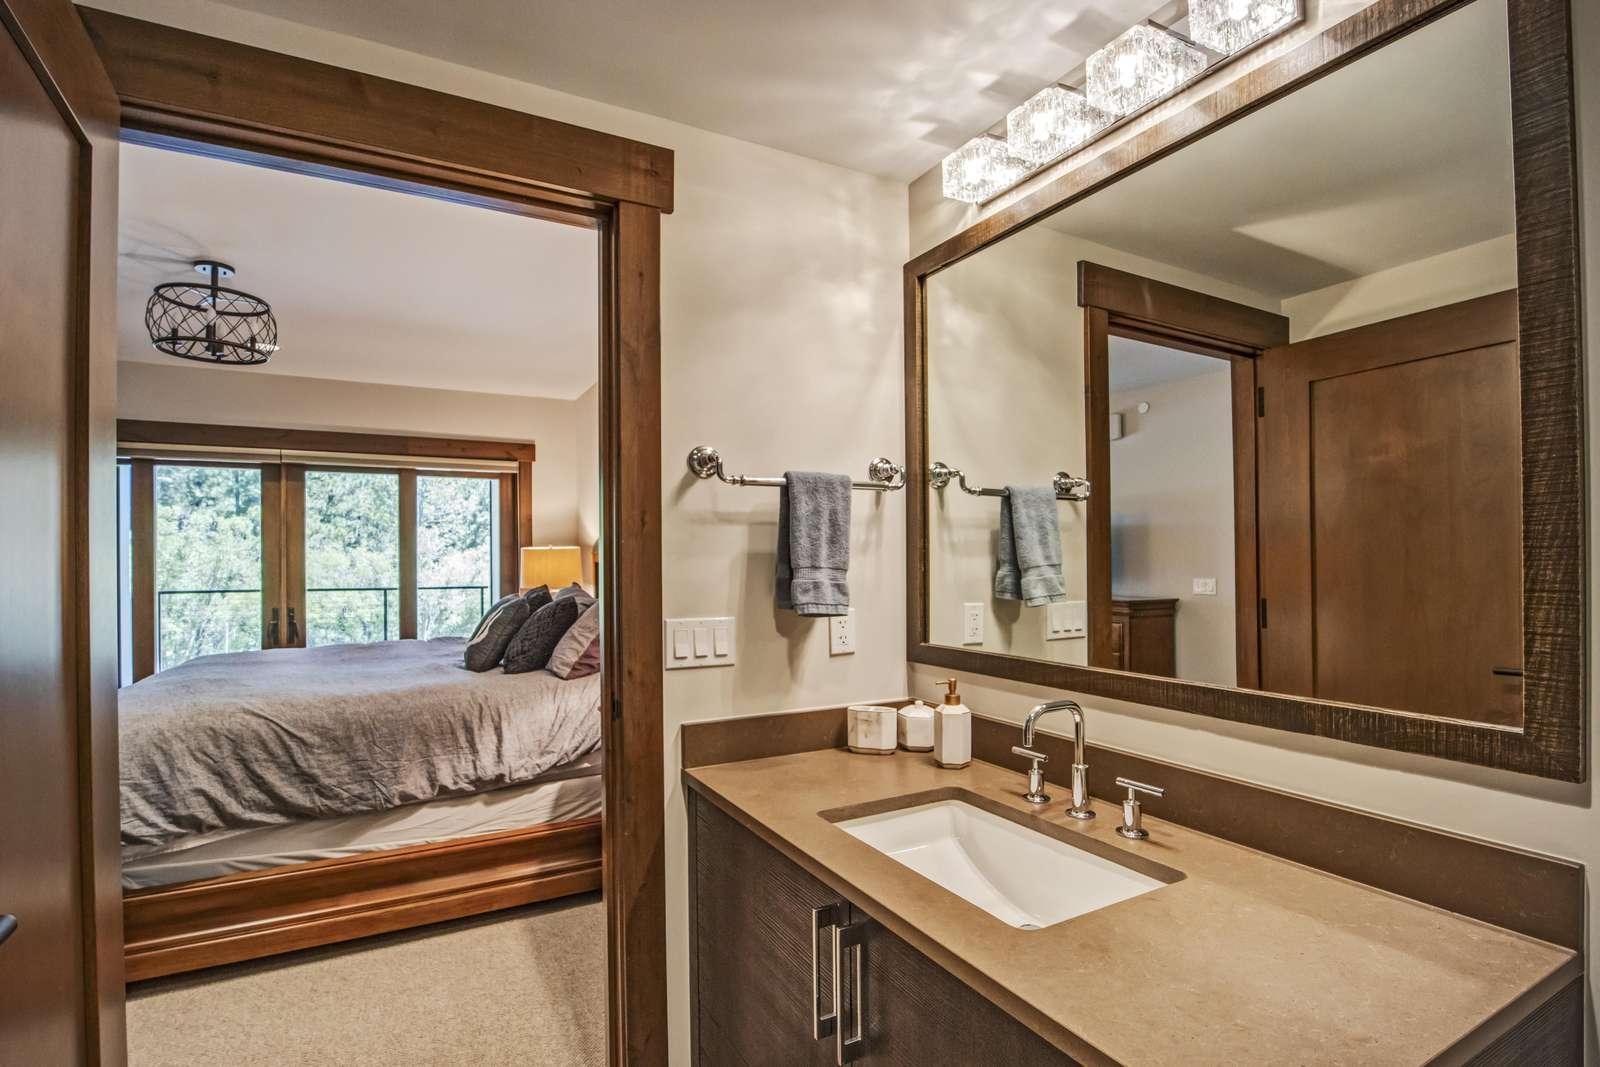 Downstairs Master 2 Bath